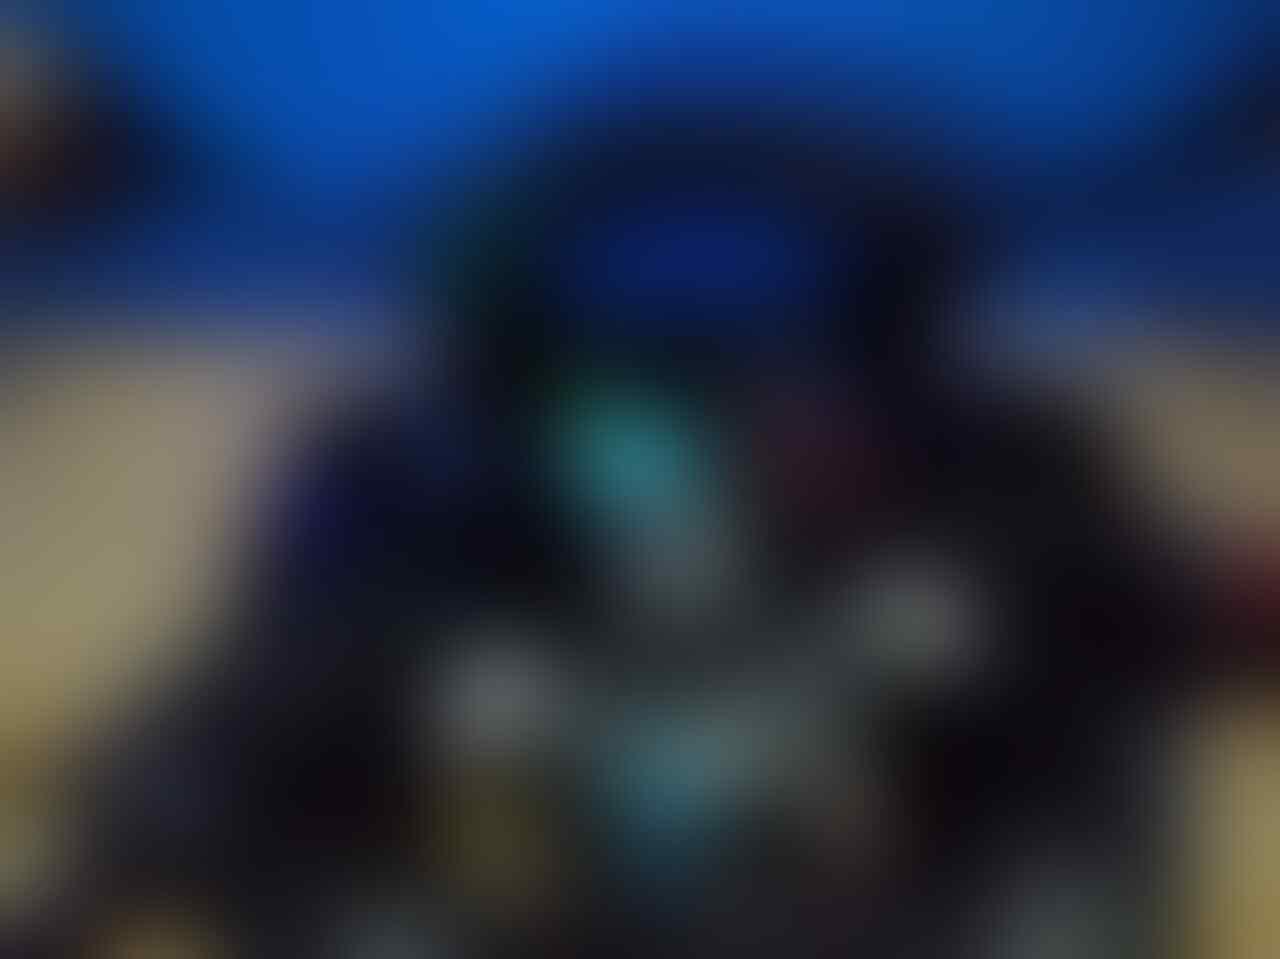 [R15ER] Yamaha R15 Kaskus Rider Community - Part 1